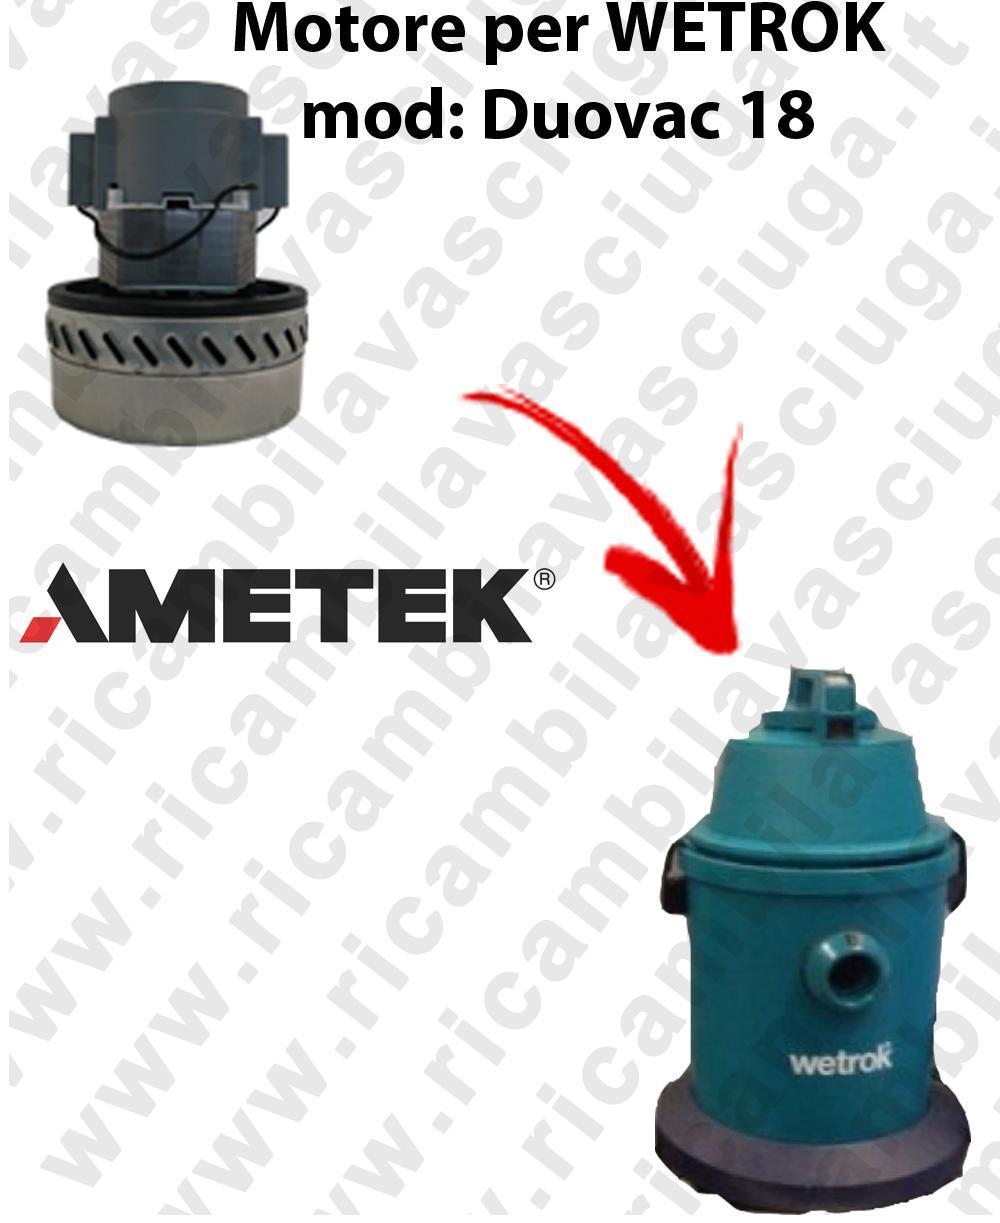 DUOVAC 18 Motore de aspiración AMETEK  para aspiradora WETROK